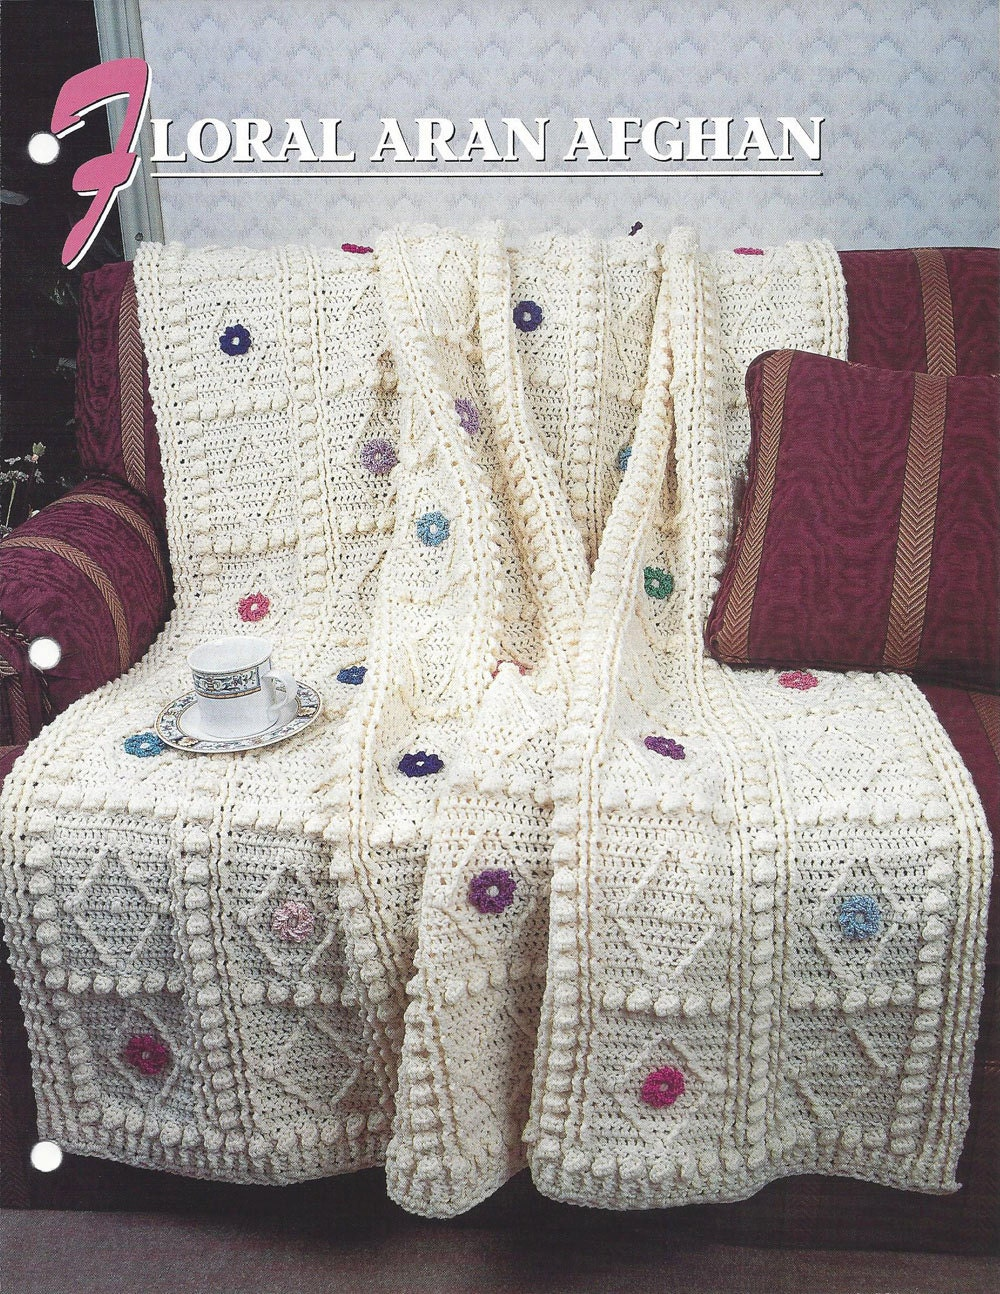 Crochet Afghan Patterns Quilt : Floral Aran Afghan Pattern Annies Crochet Quilt